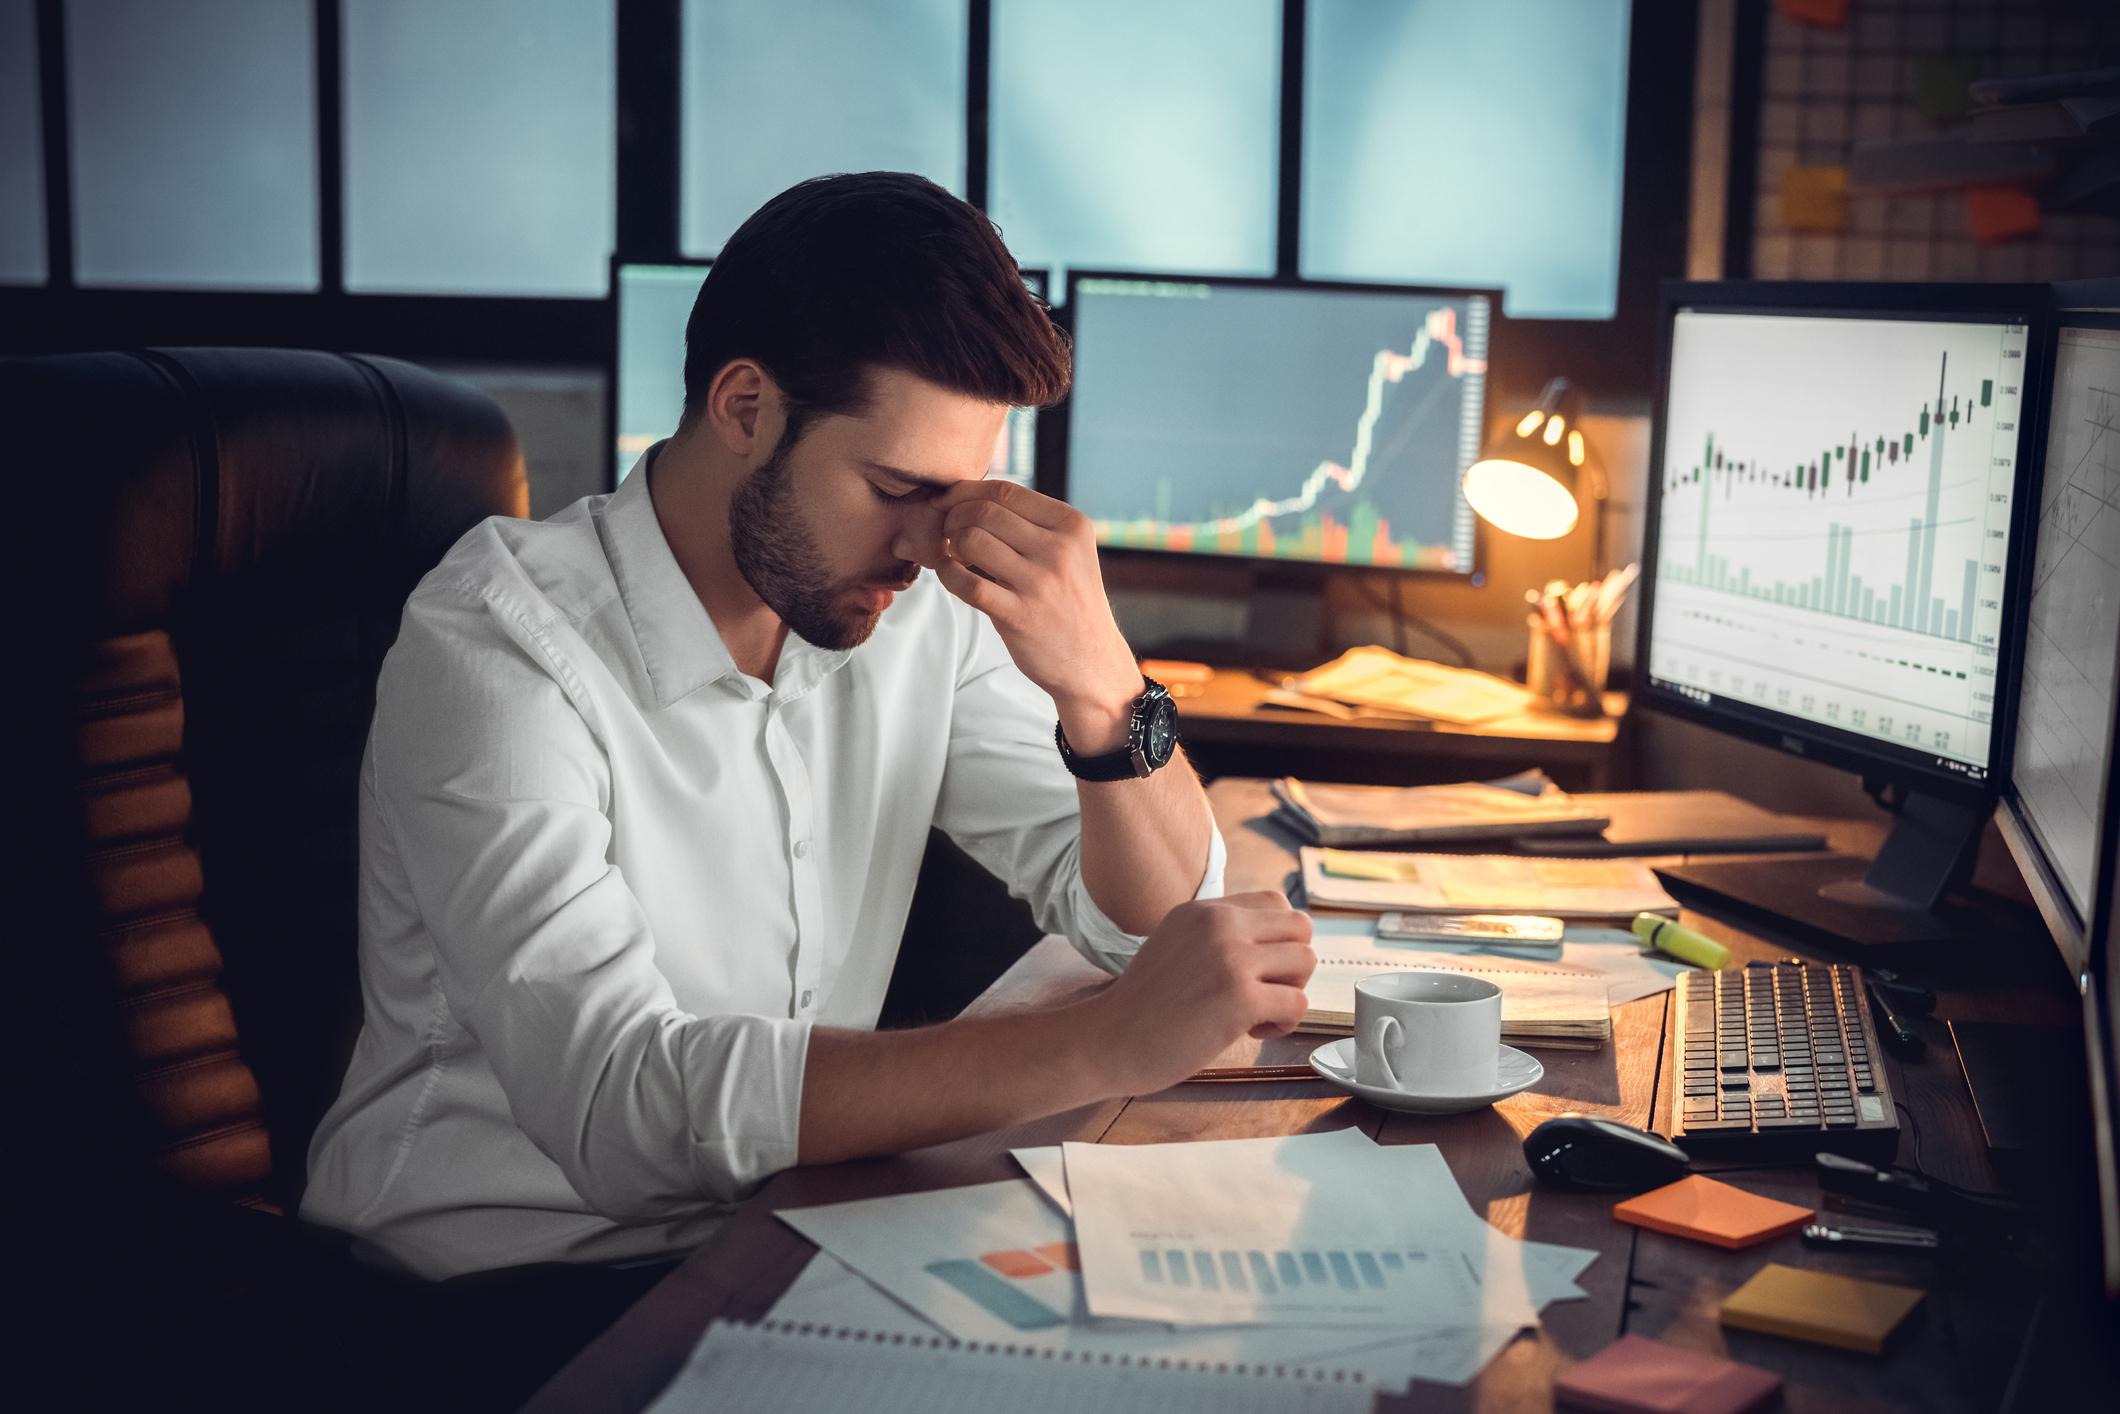 Man showing episodic acute stress at work